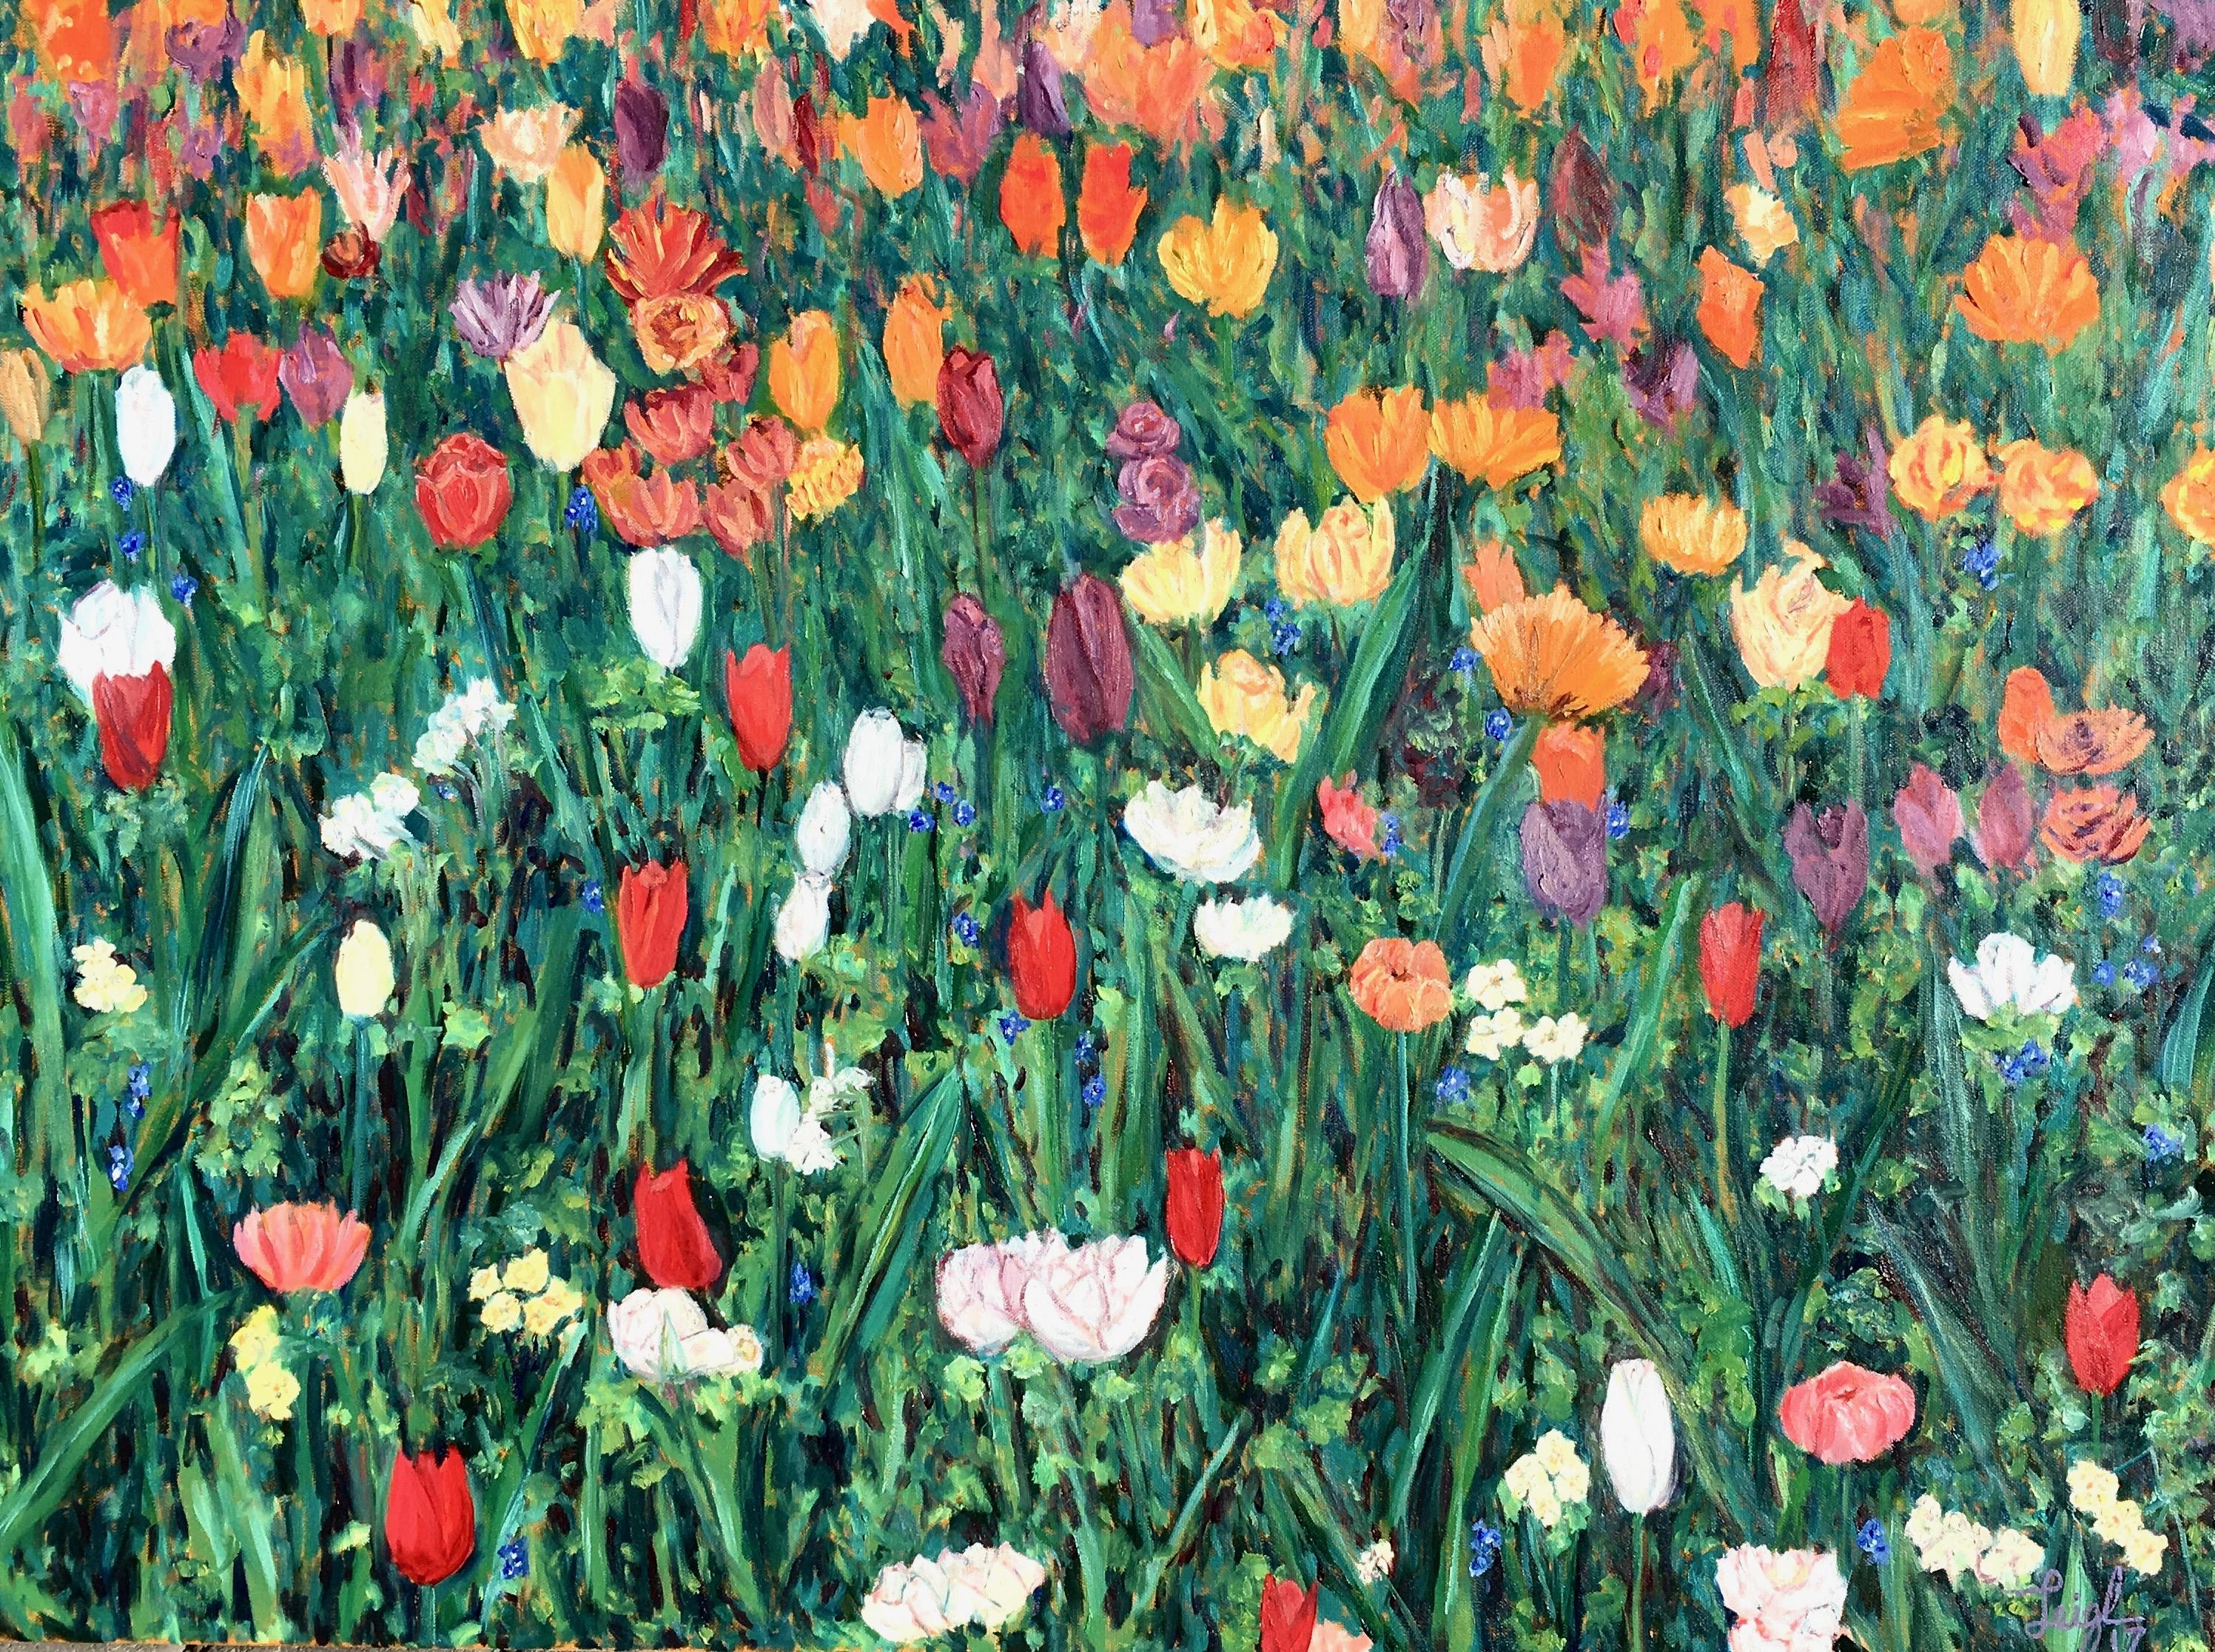 Keukenhof Flowers #1  ~  Ana Miletic Sedy, Rancho Penasquitos, CA   2017  •  40 x 30